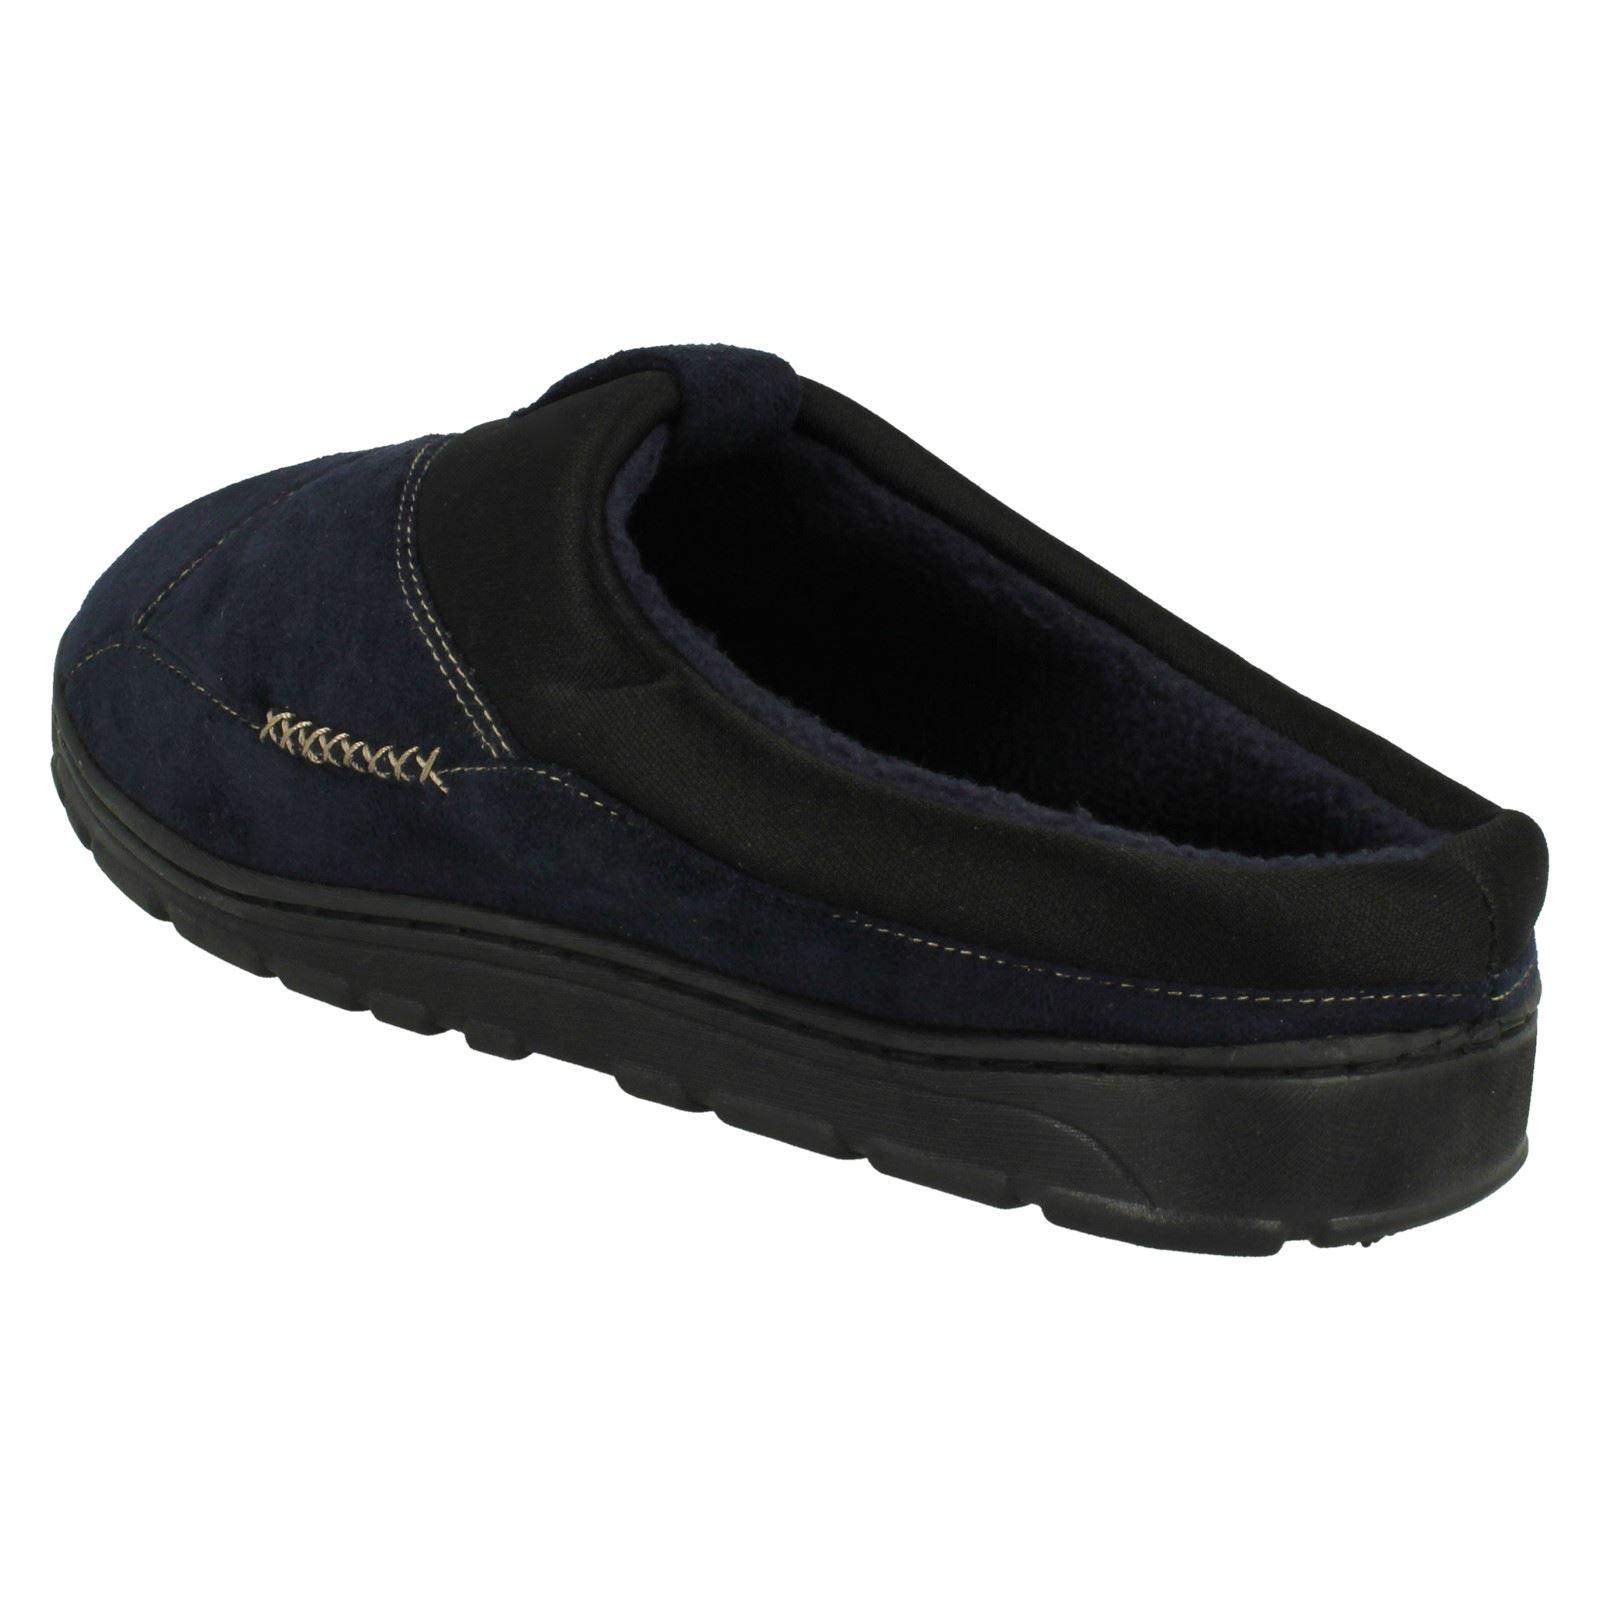 Mens Spot On Casual Slip On Slippers /'Brock/'